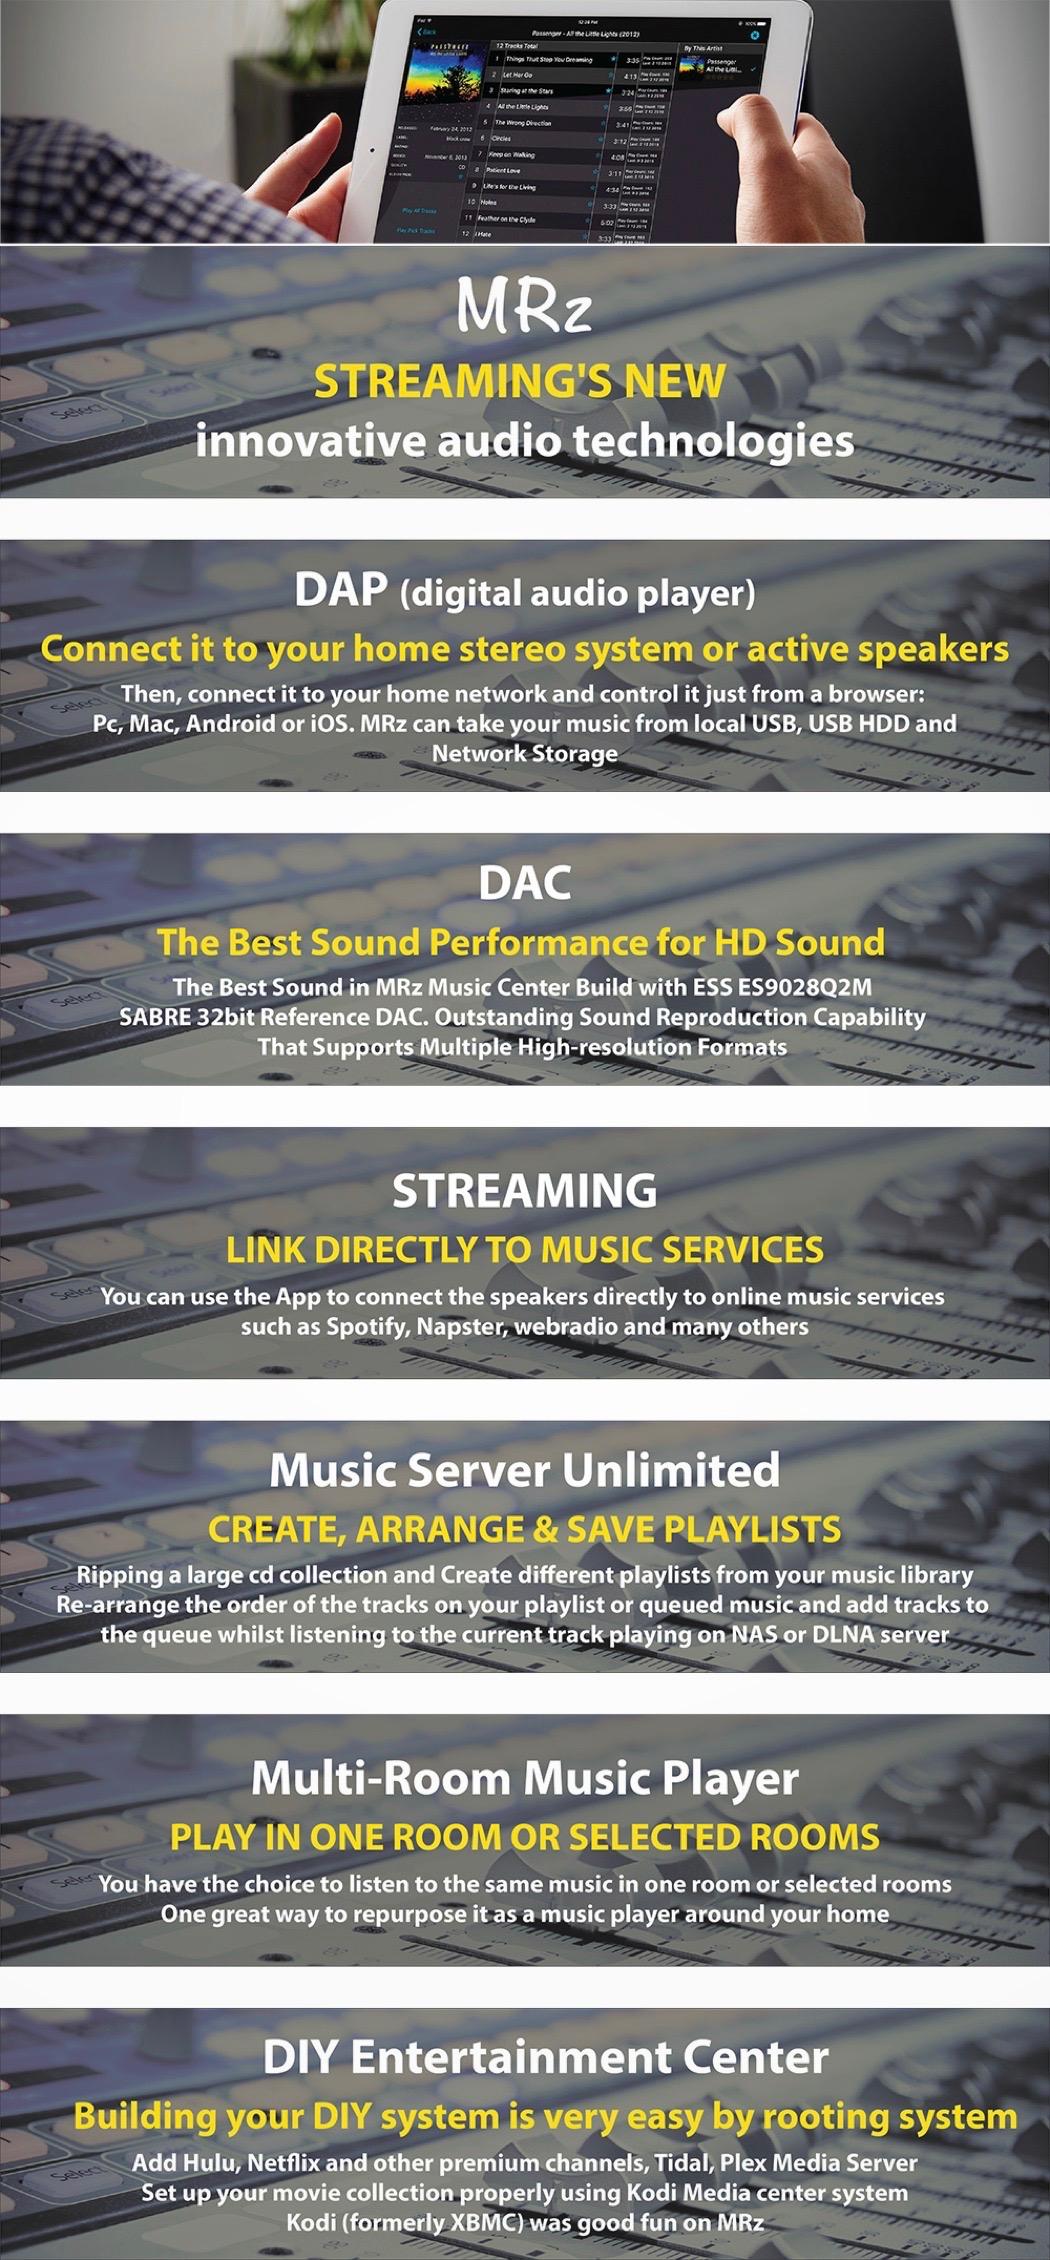 mrz_music_streaming_device_15